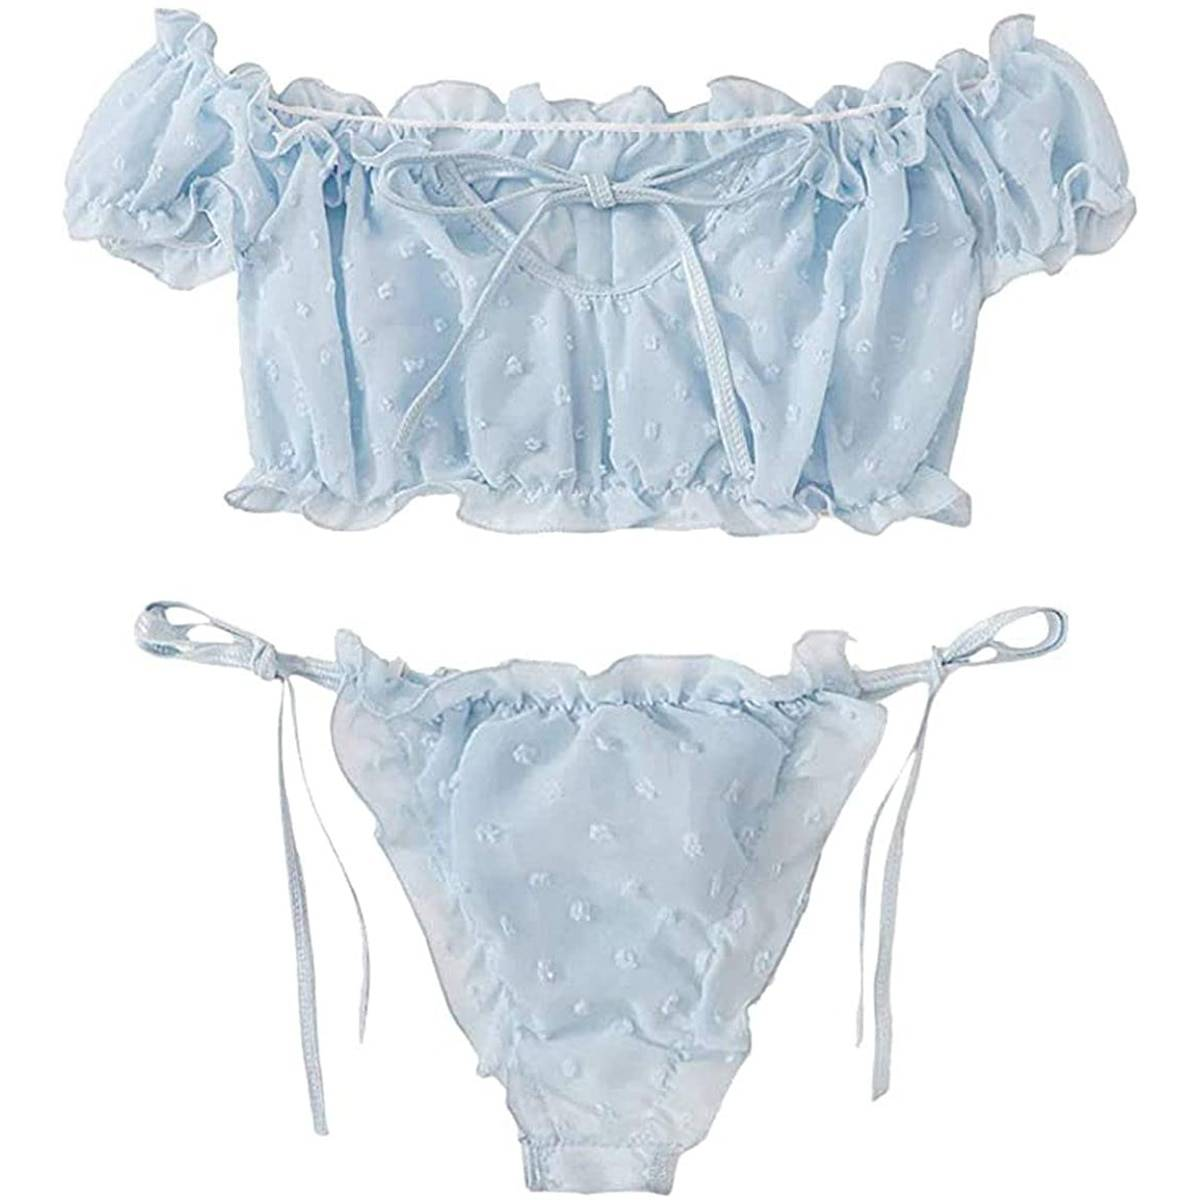 Summer Women Sexy Off Shoulder Lace Up Swimsuits Erotic Hot Lingerie Underwear Set Swimsuits Bathing Bikini Suit Plus Size